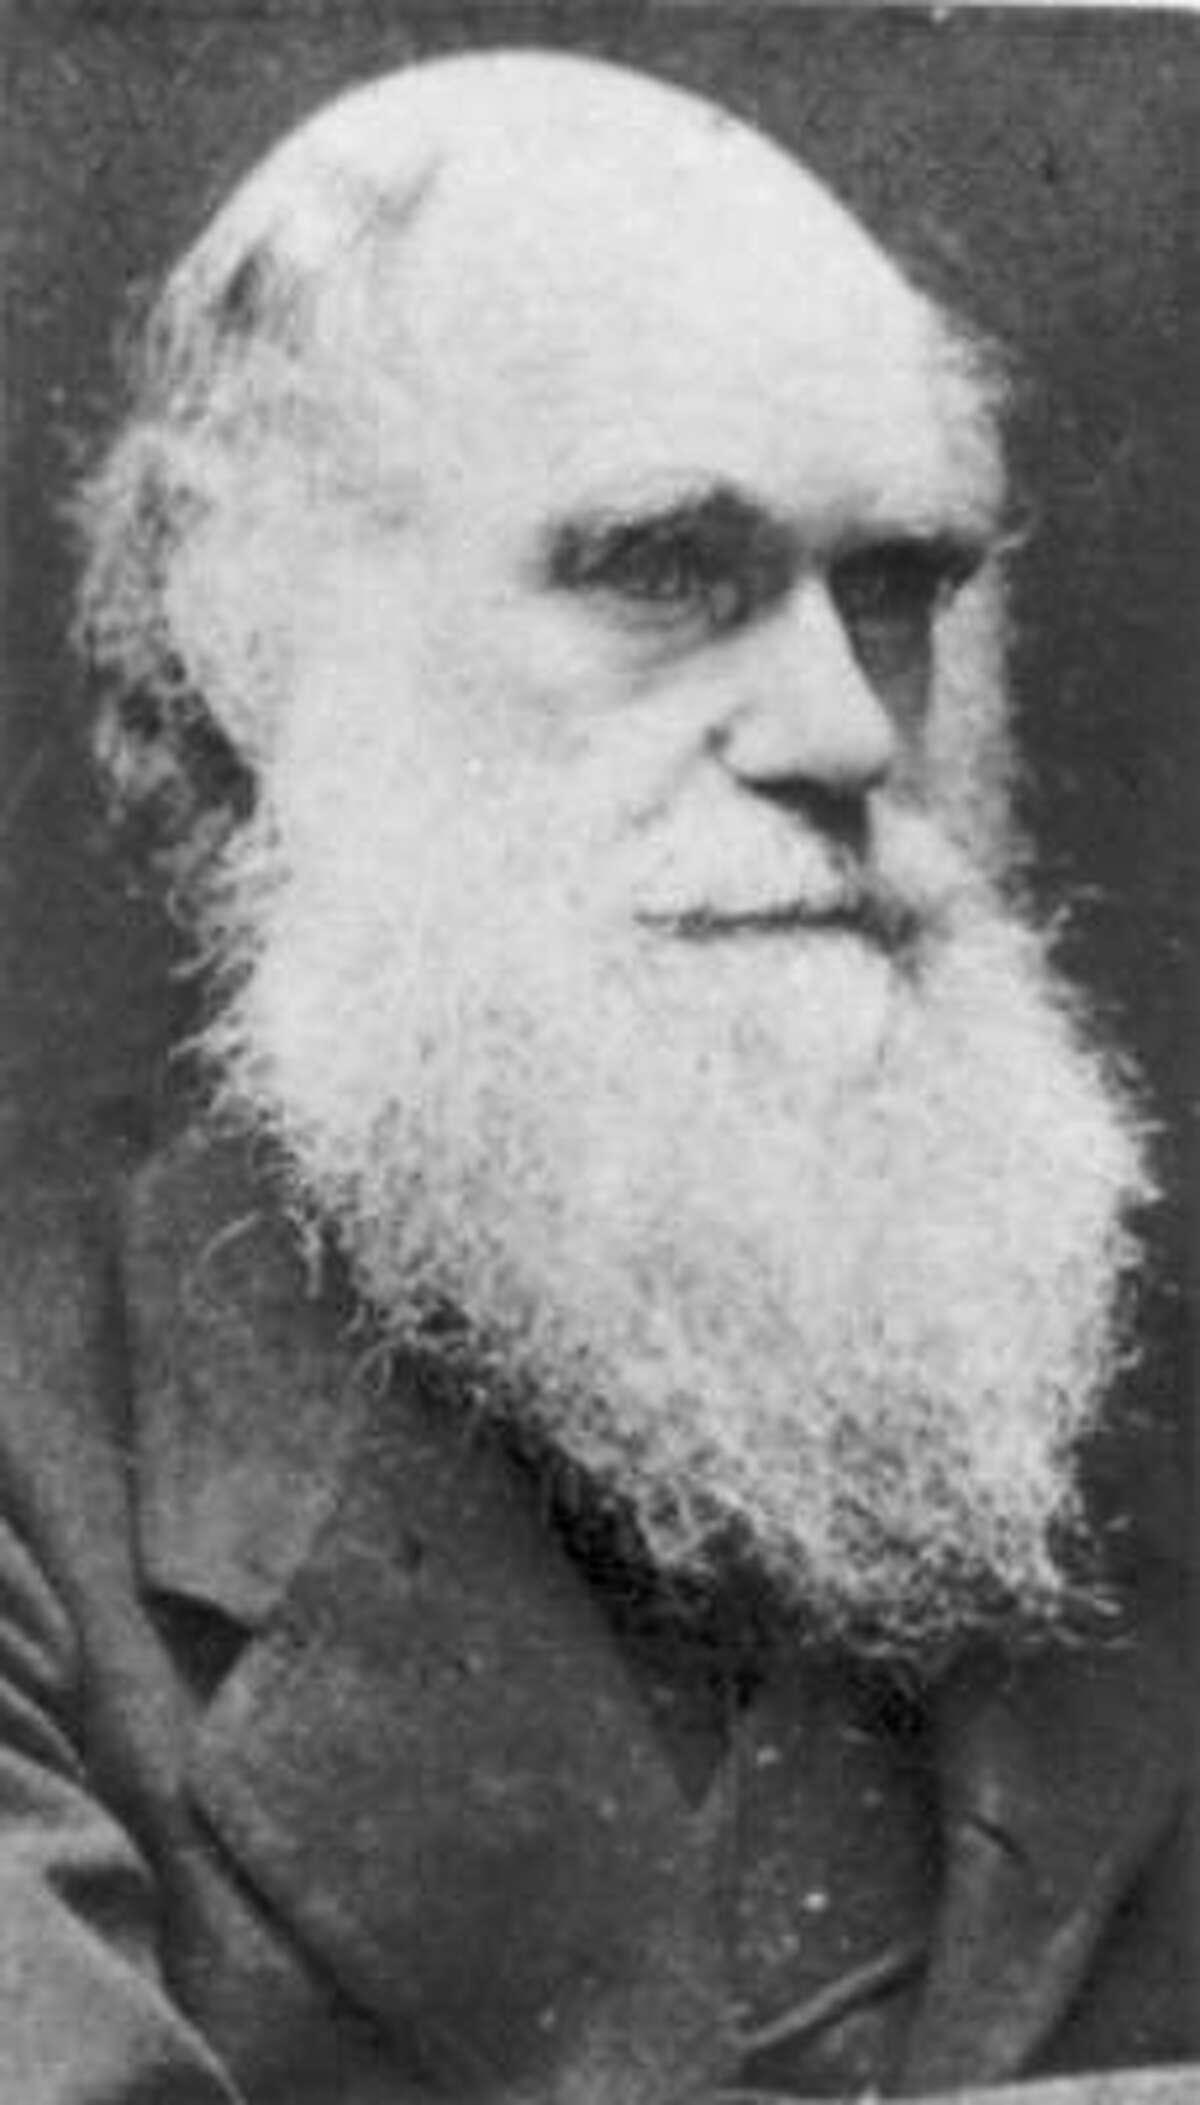 Birth Charles Darwin was born Feb. 12, 1809, the son of a physician.